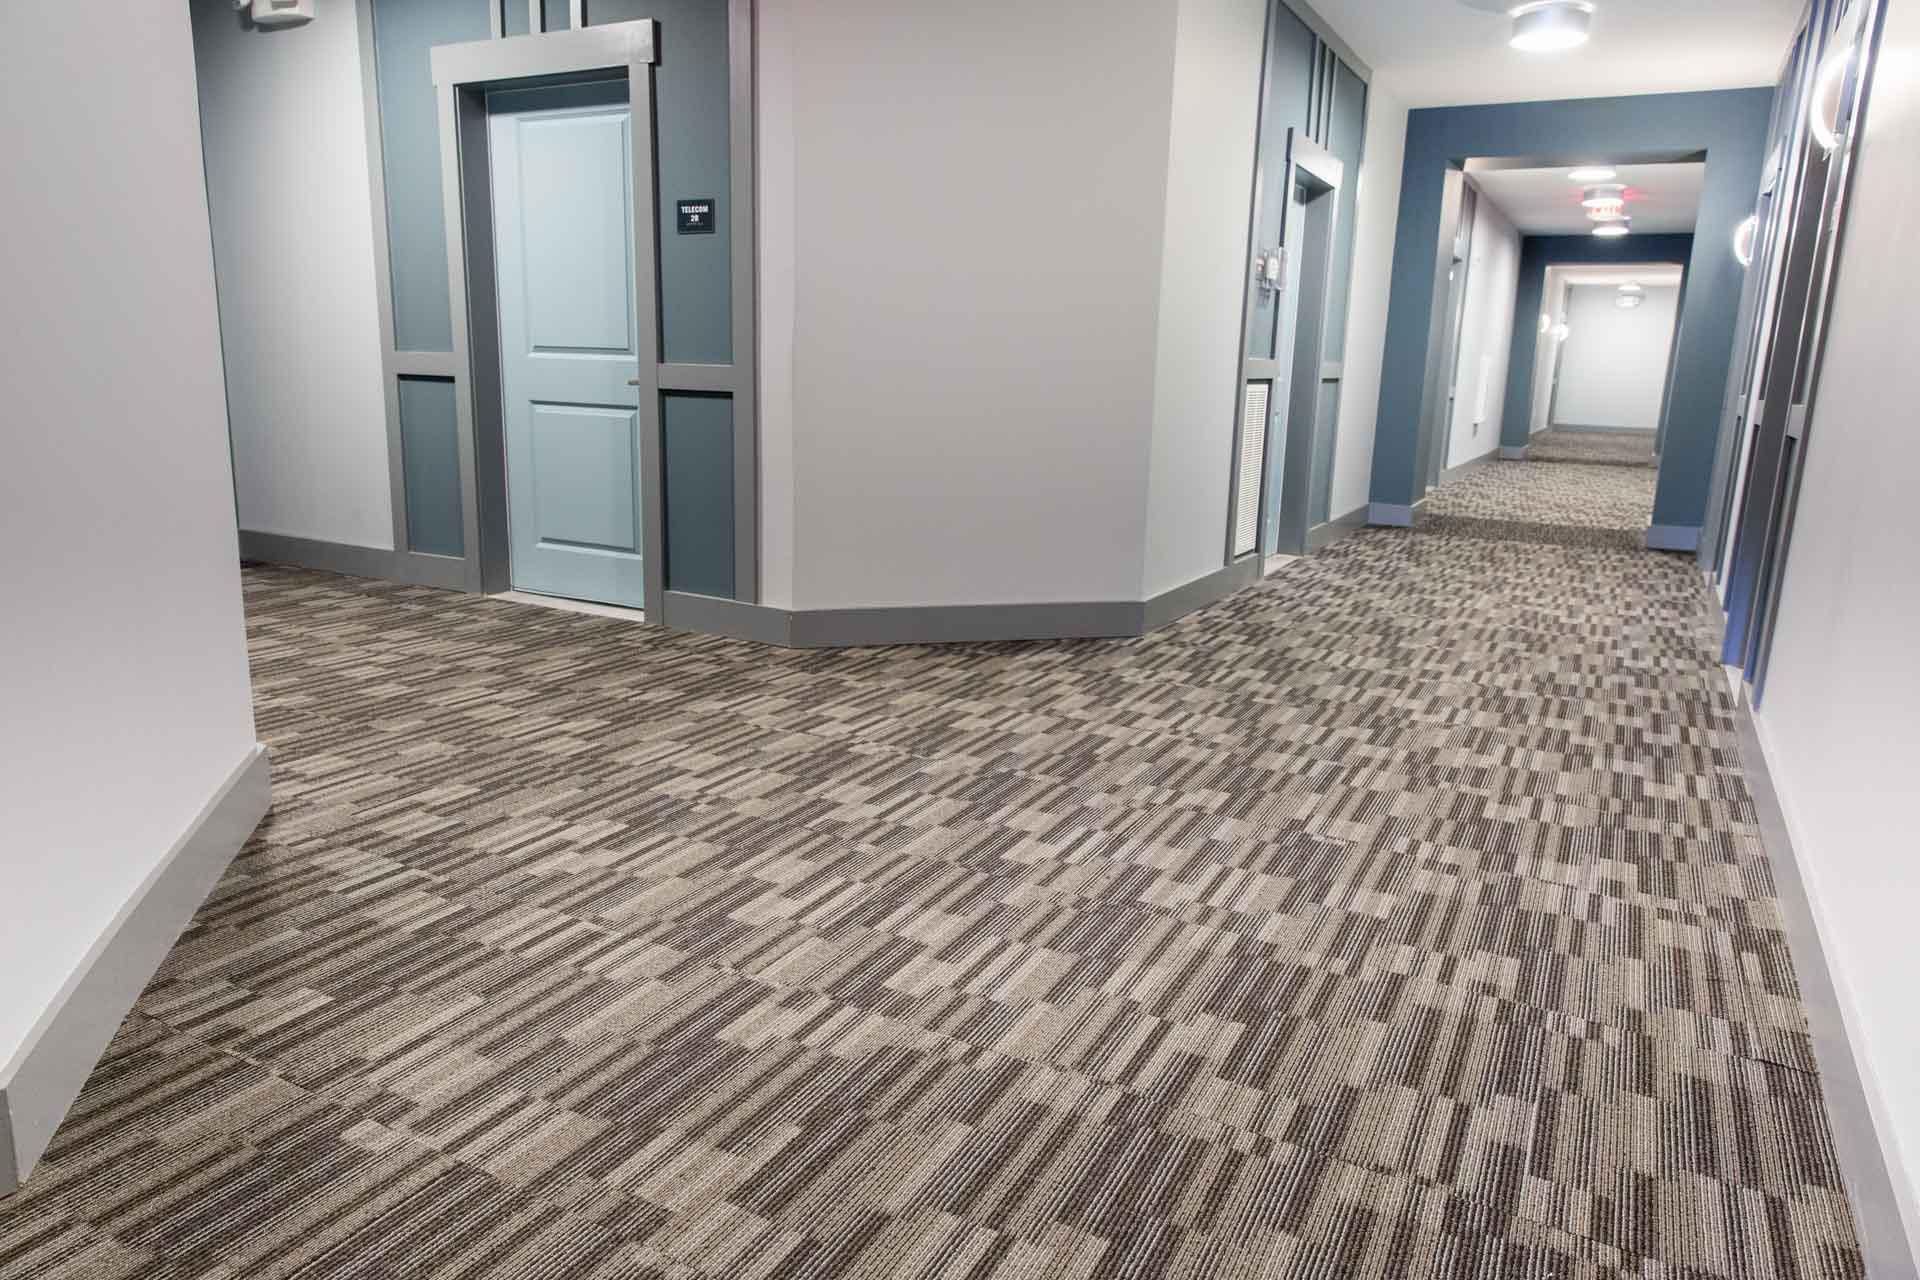 Sound Absorbing Hallway Carpet